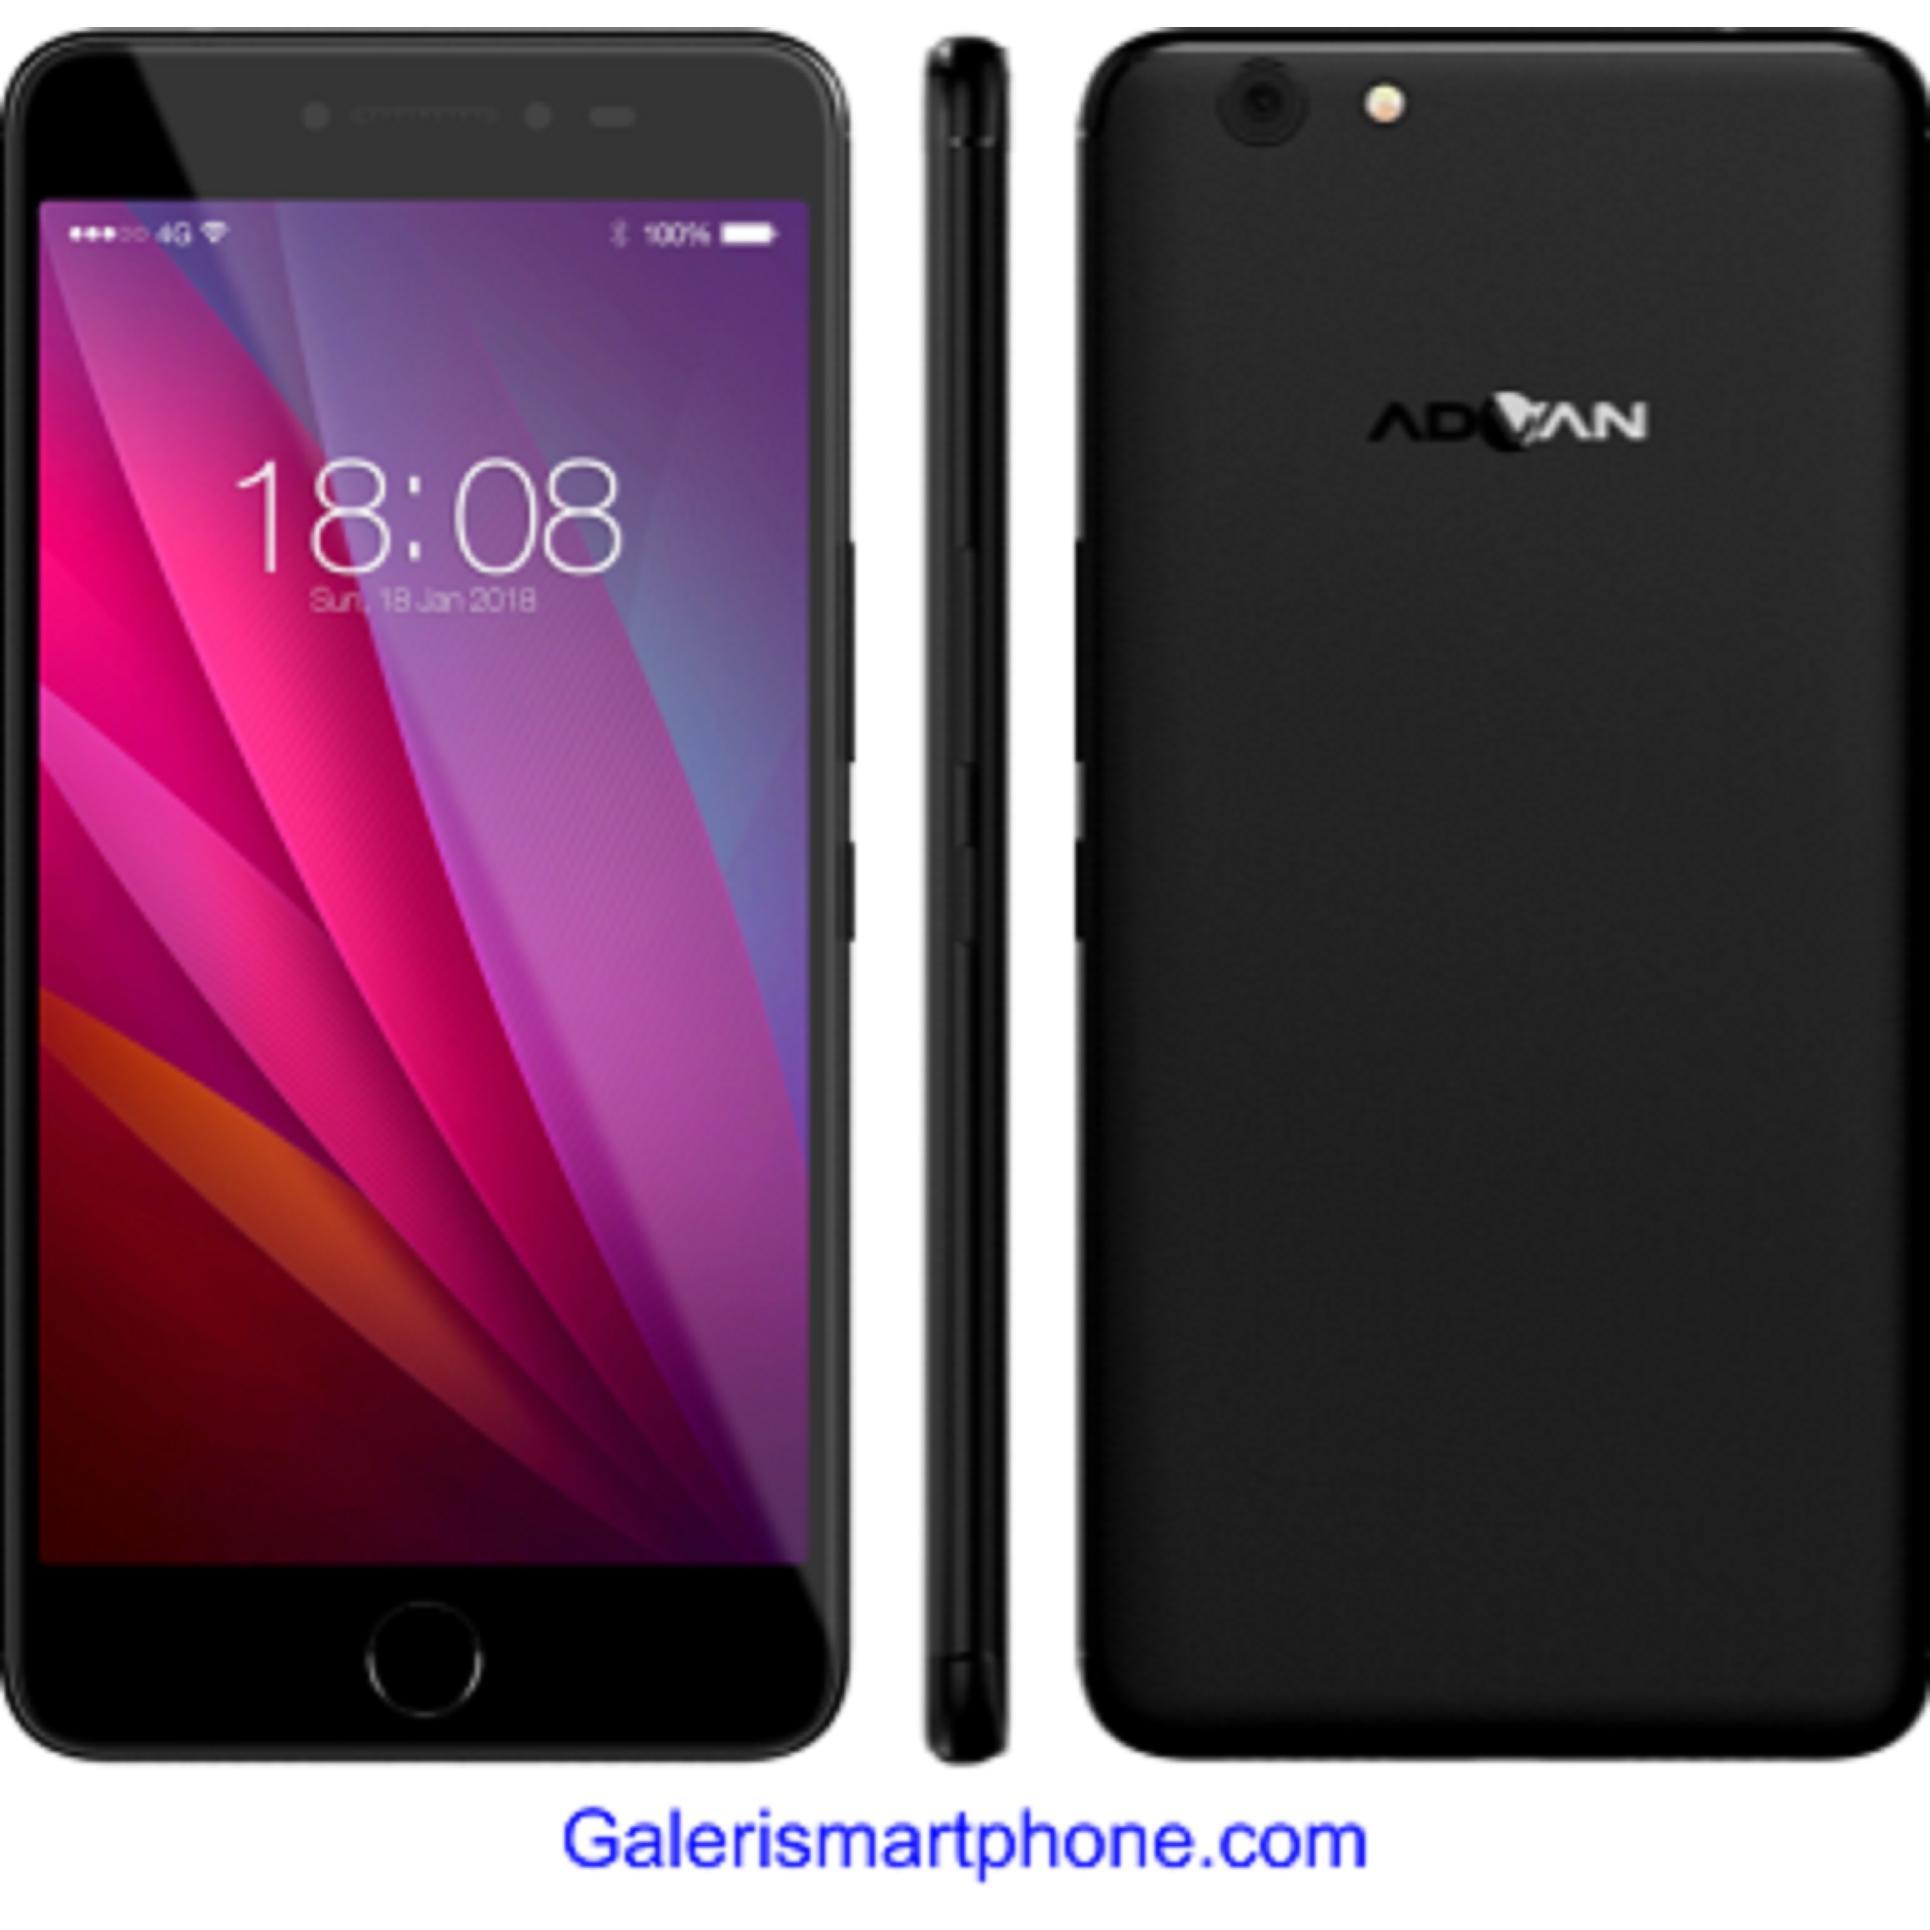 Daftar Harga Hp Advan E1c Plus Lengkap Dan Termurah Cek Tablet I7 I Tab Ram Rom16 Garansi Resmi G2 3 32